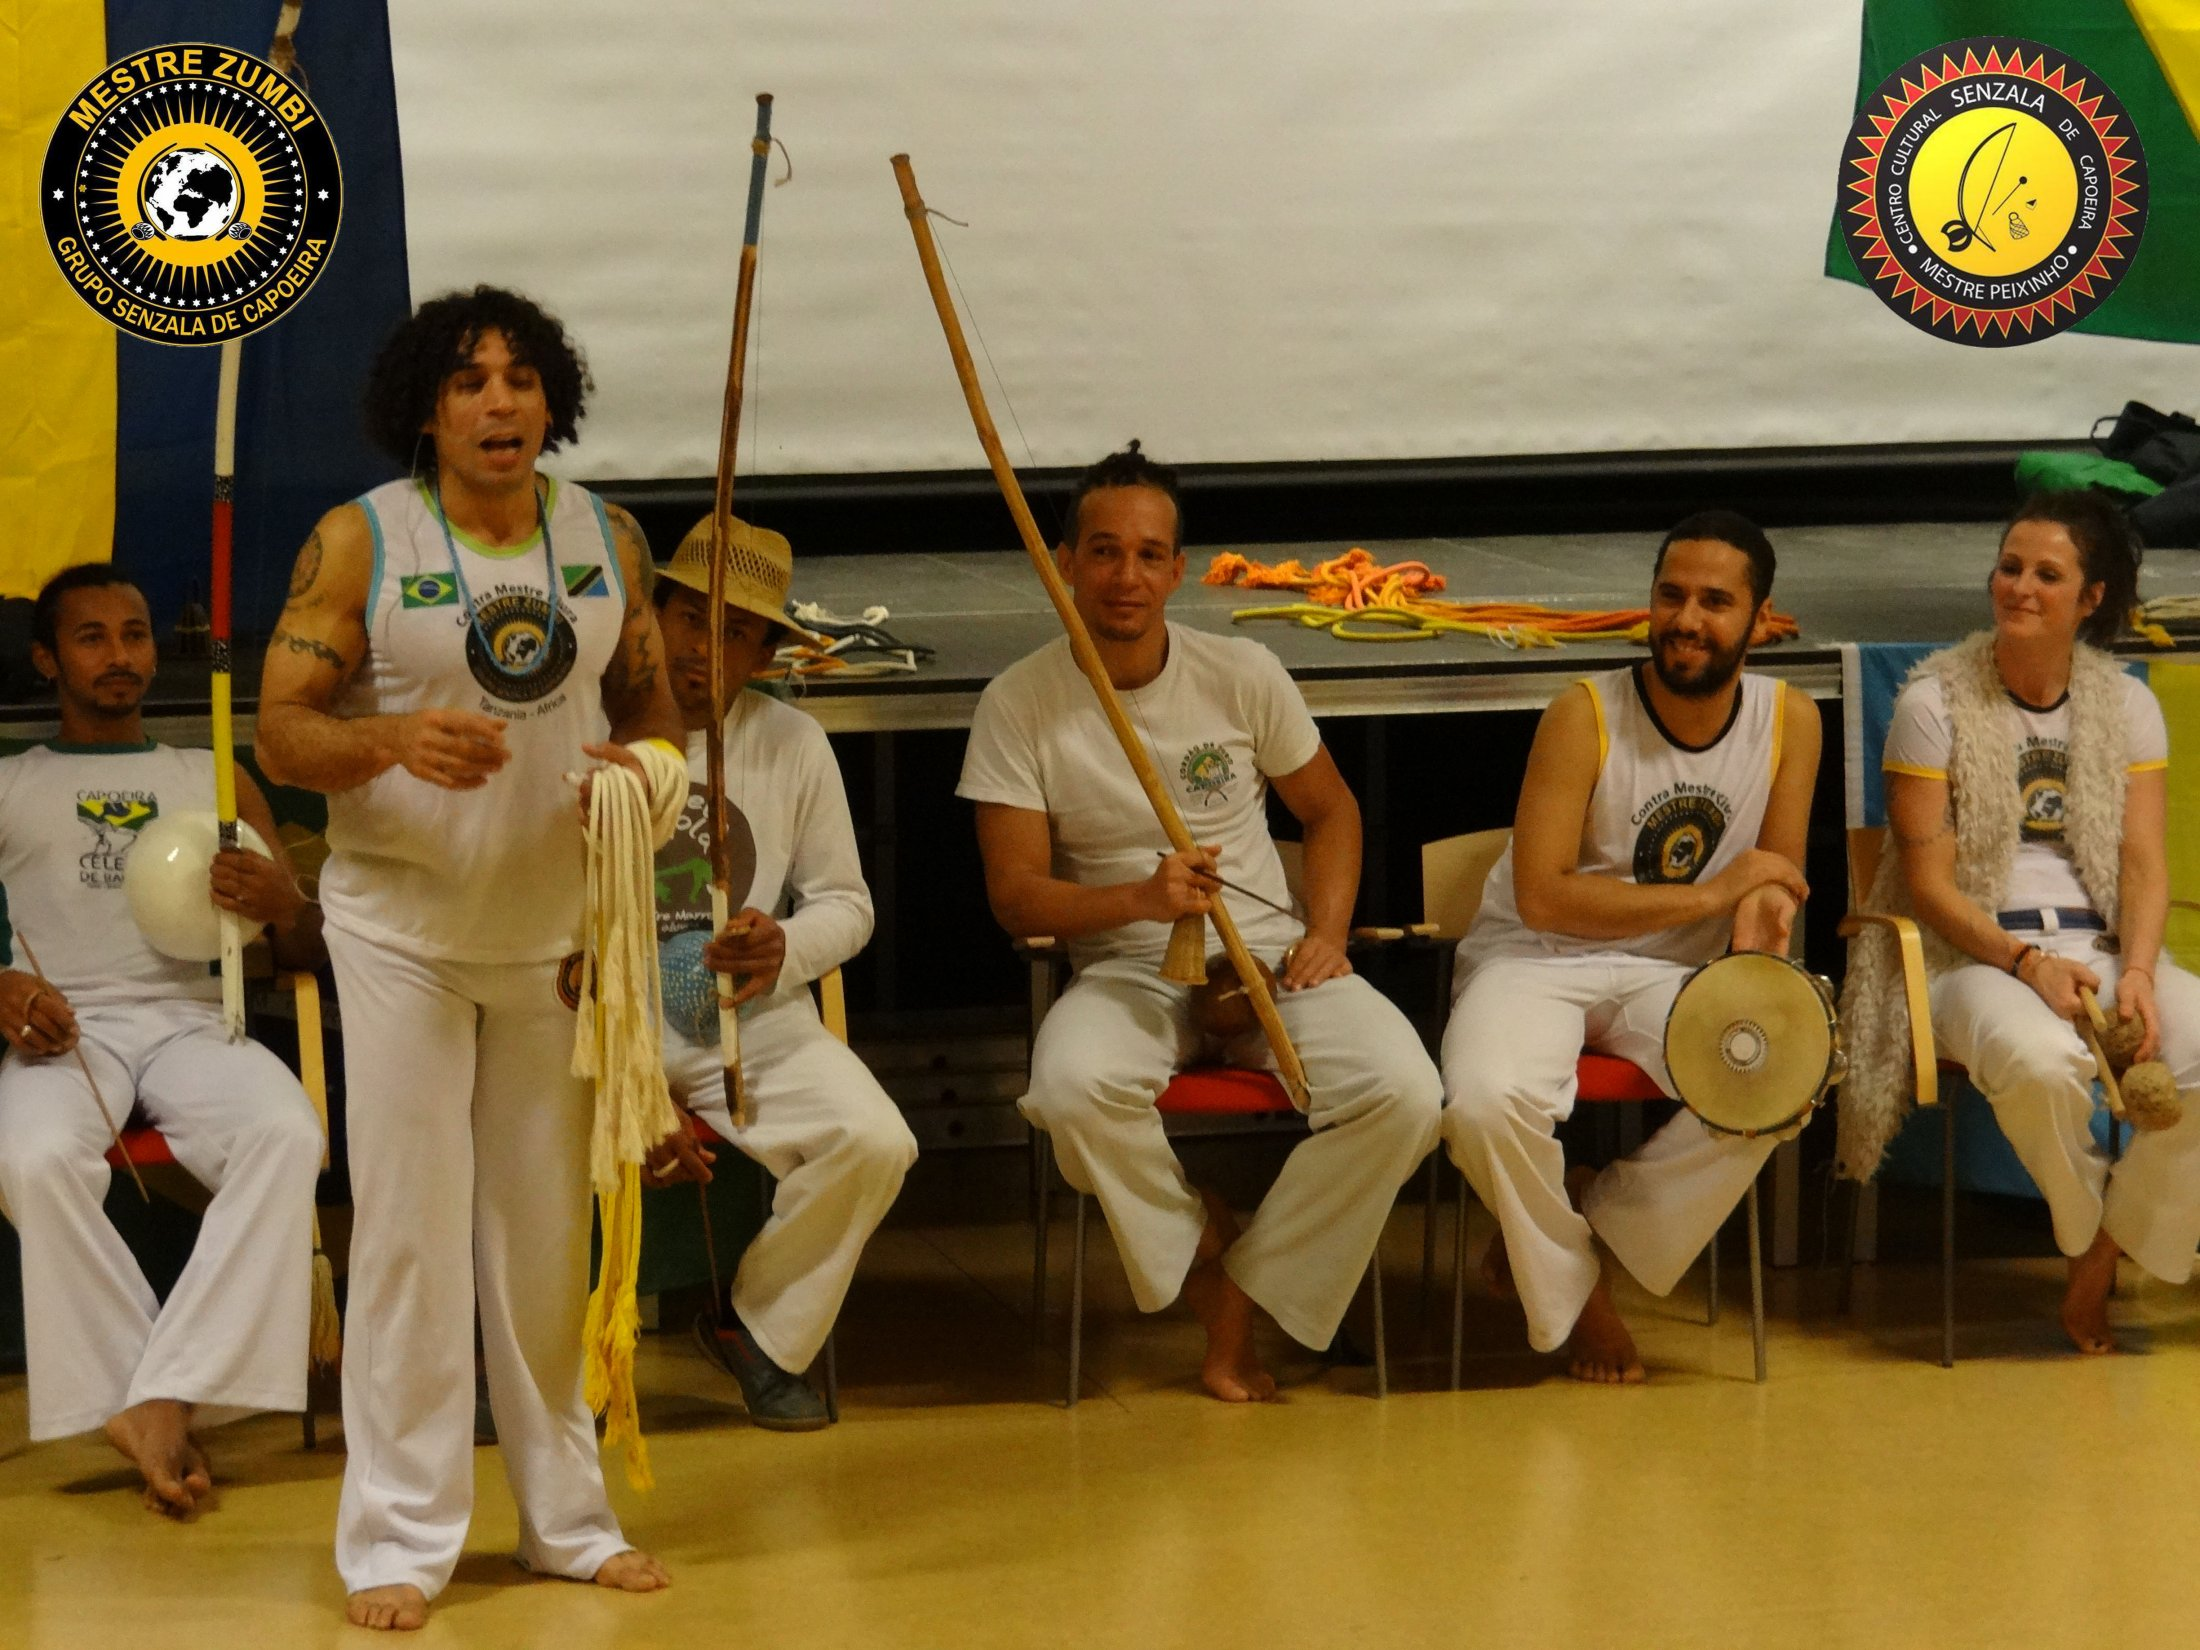 2013-12-14 - Capoeira 073